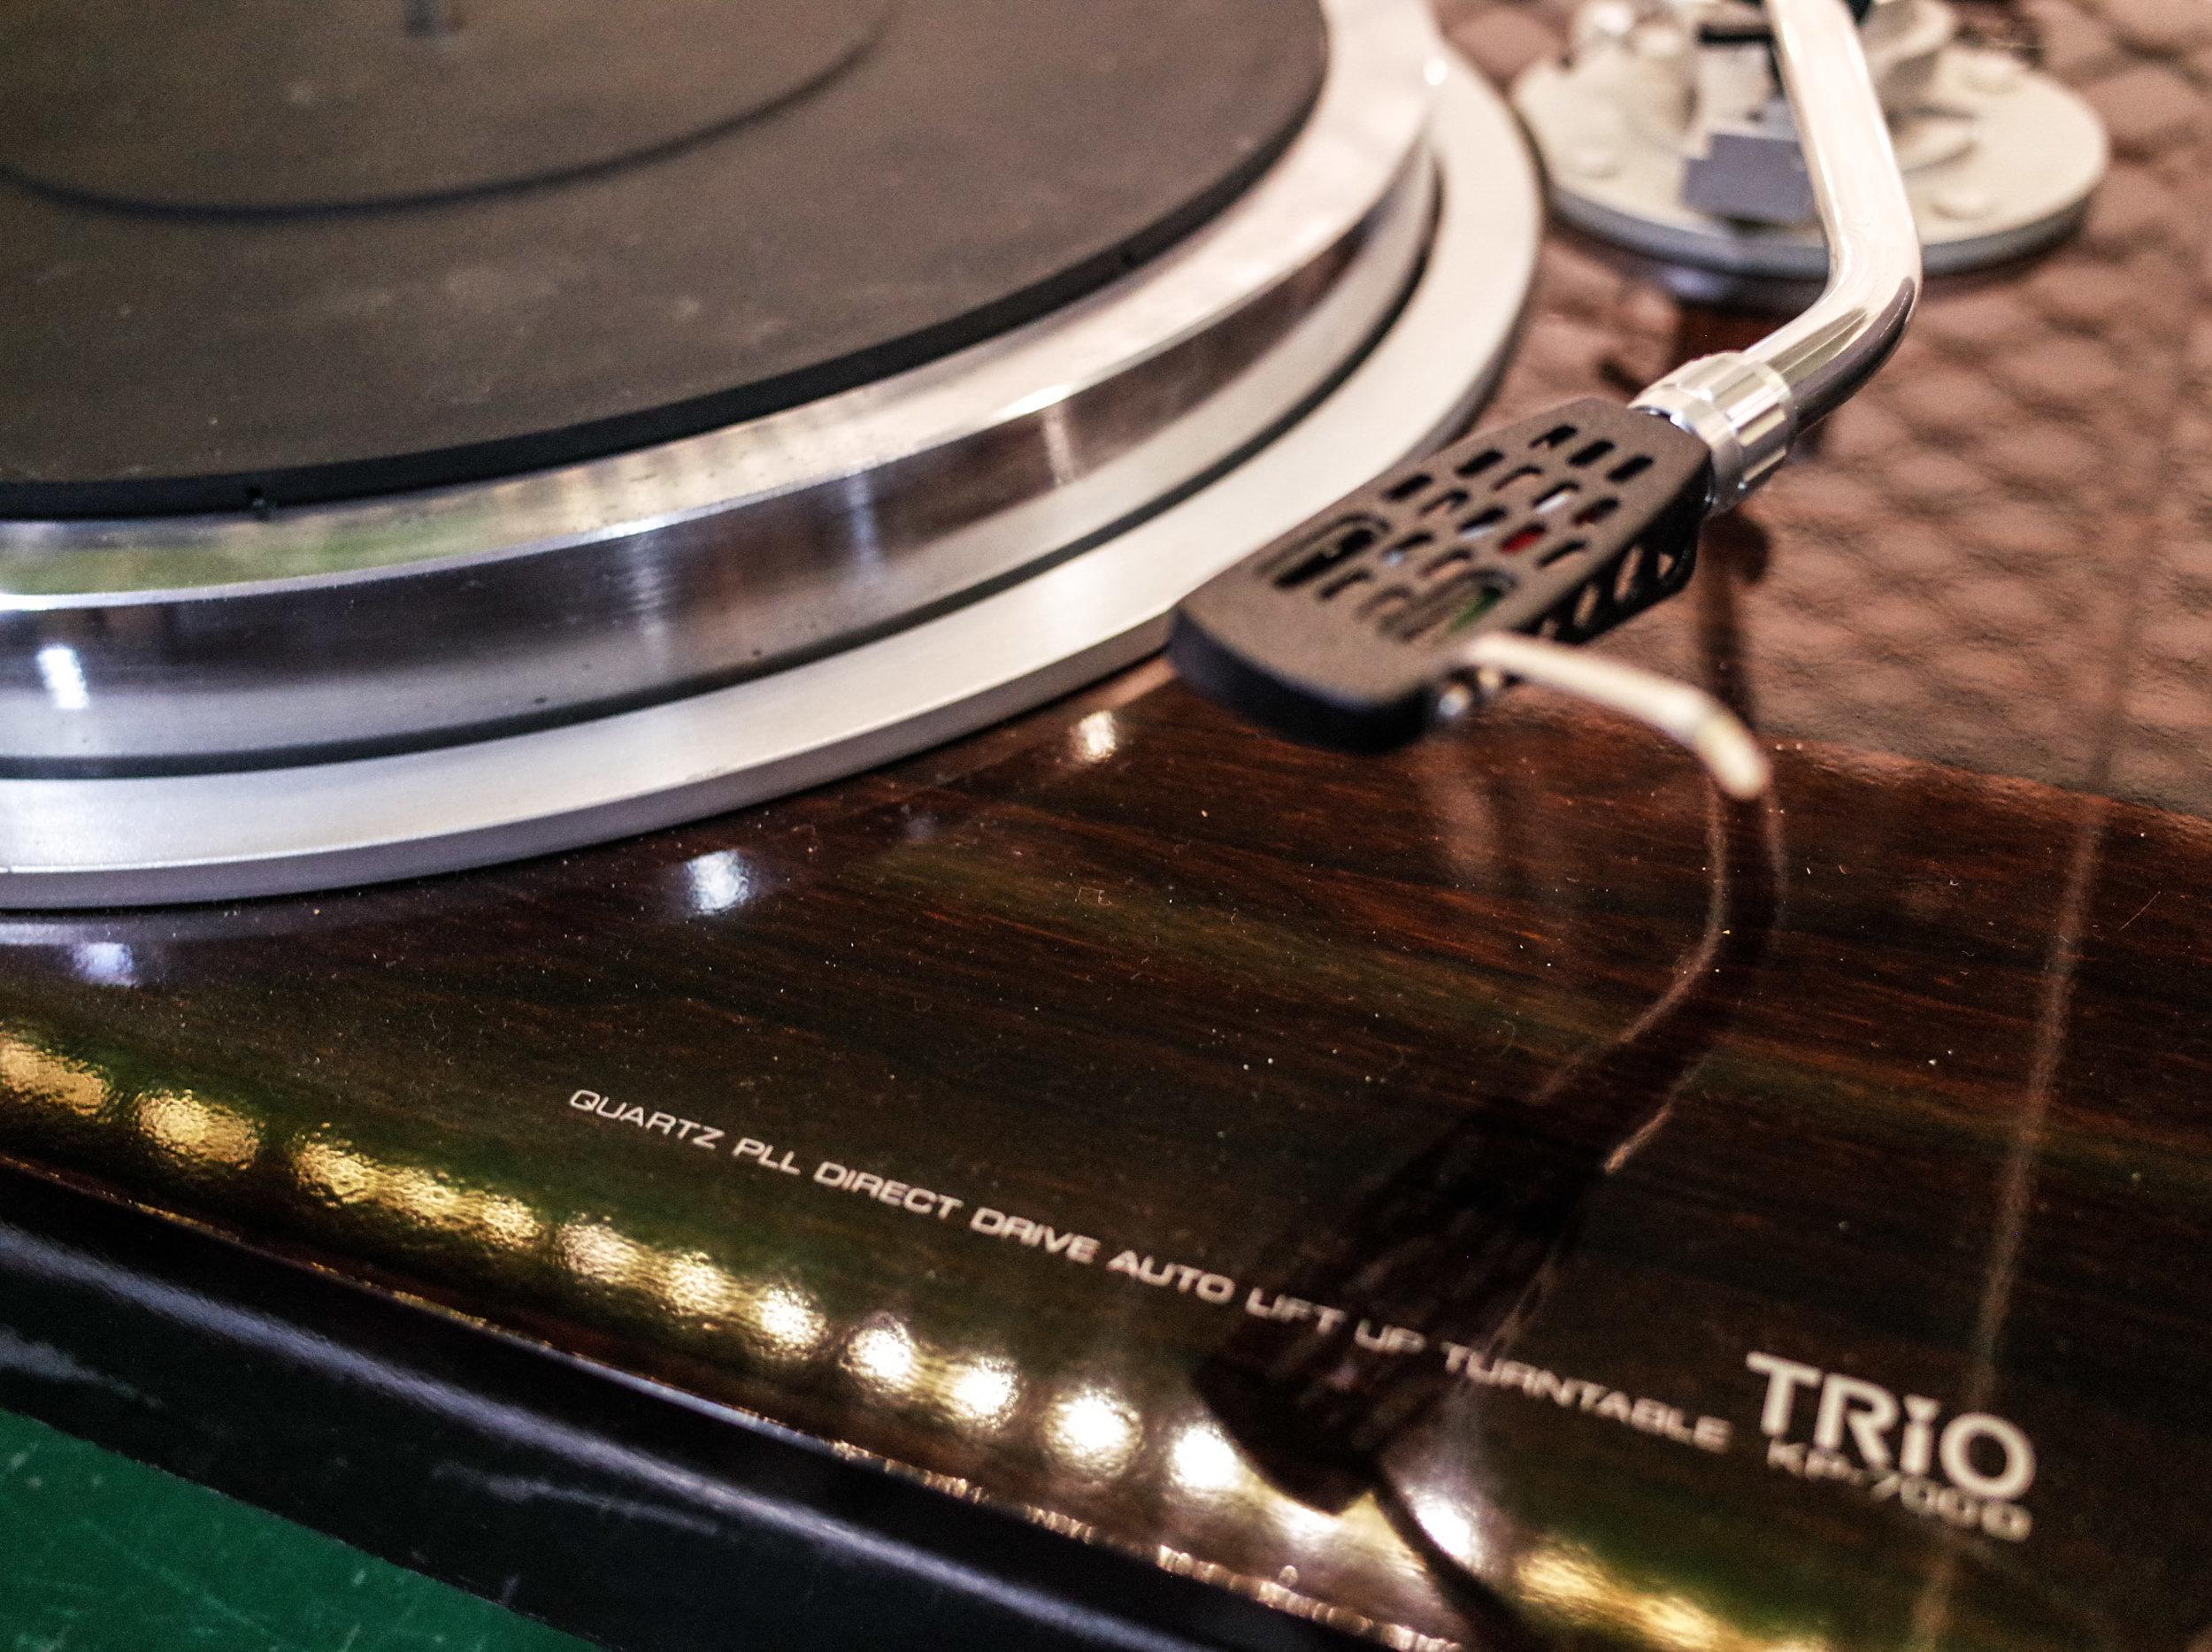 trio-kp-7000-wood-record-player.jpg